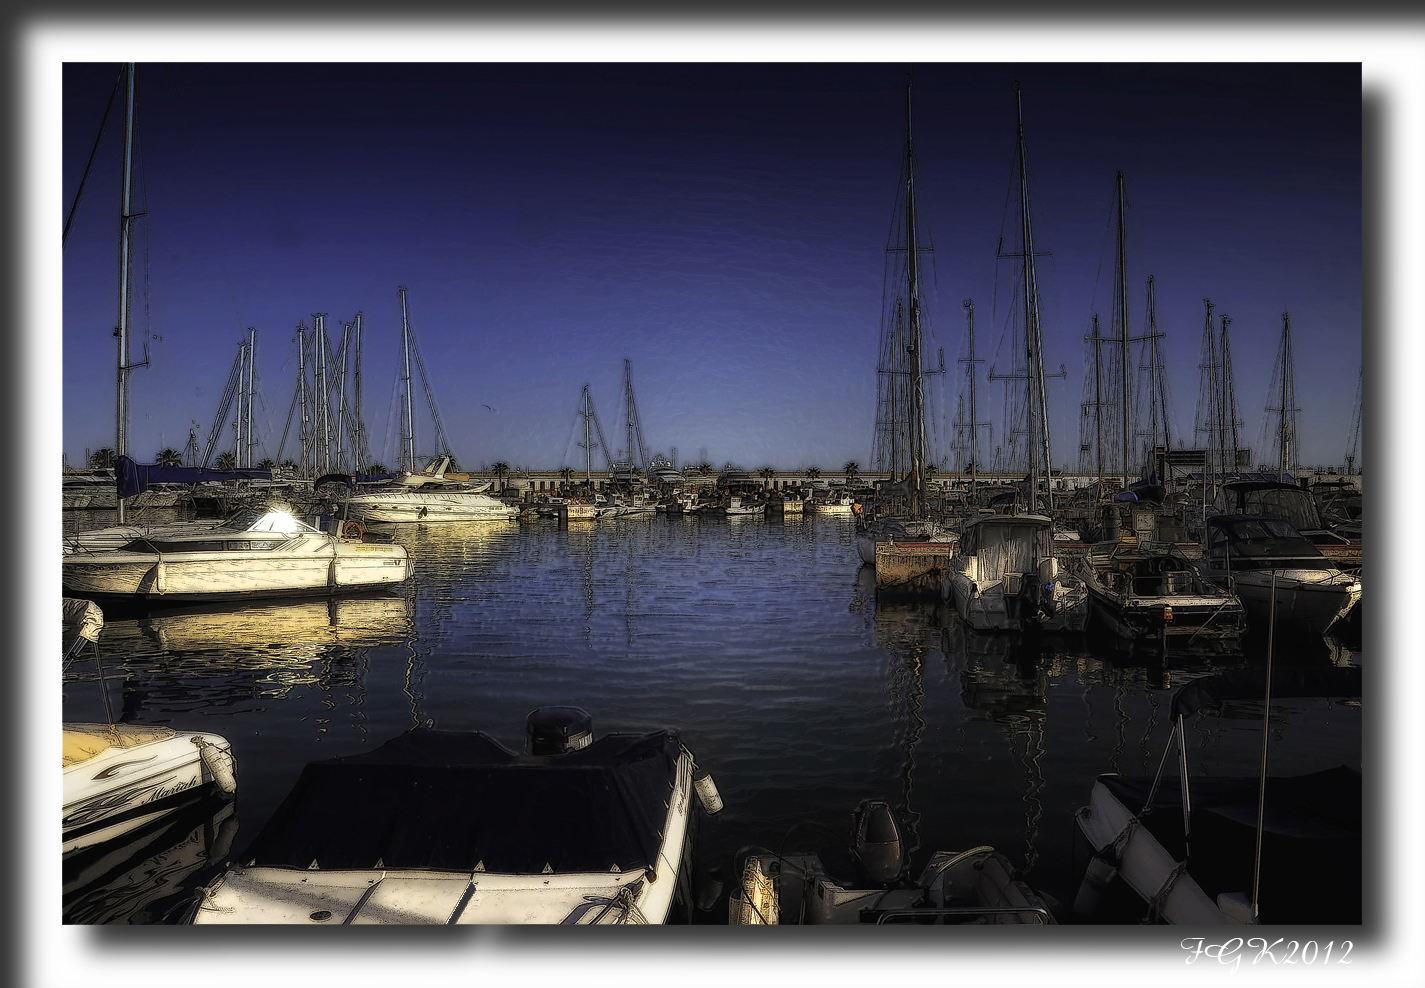 Marina 2(AiguaDolce) Sitges